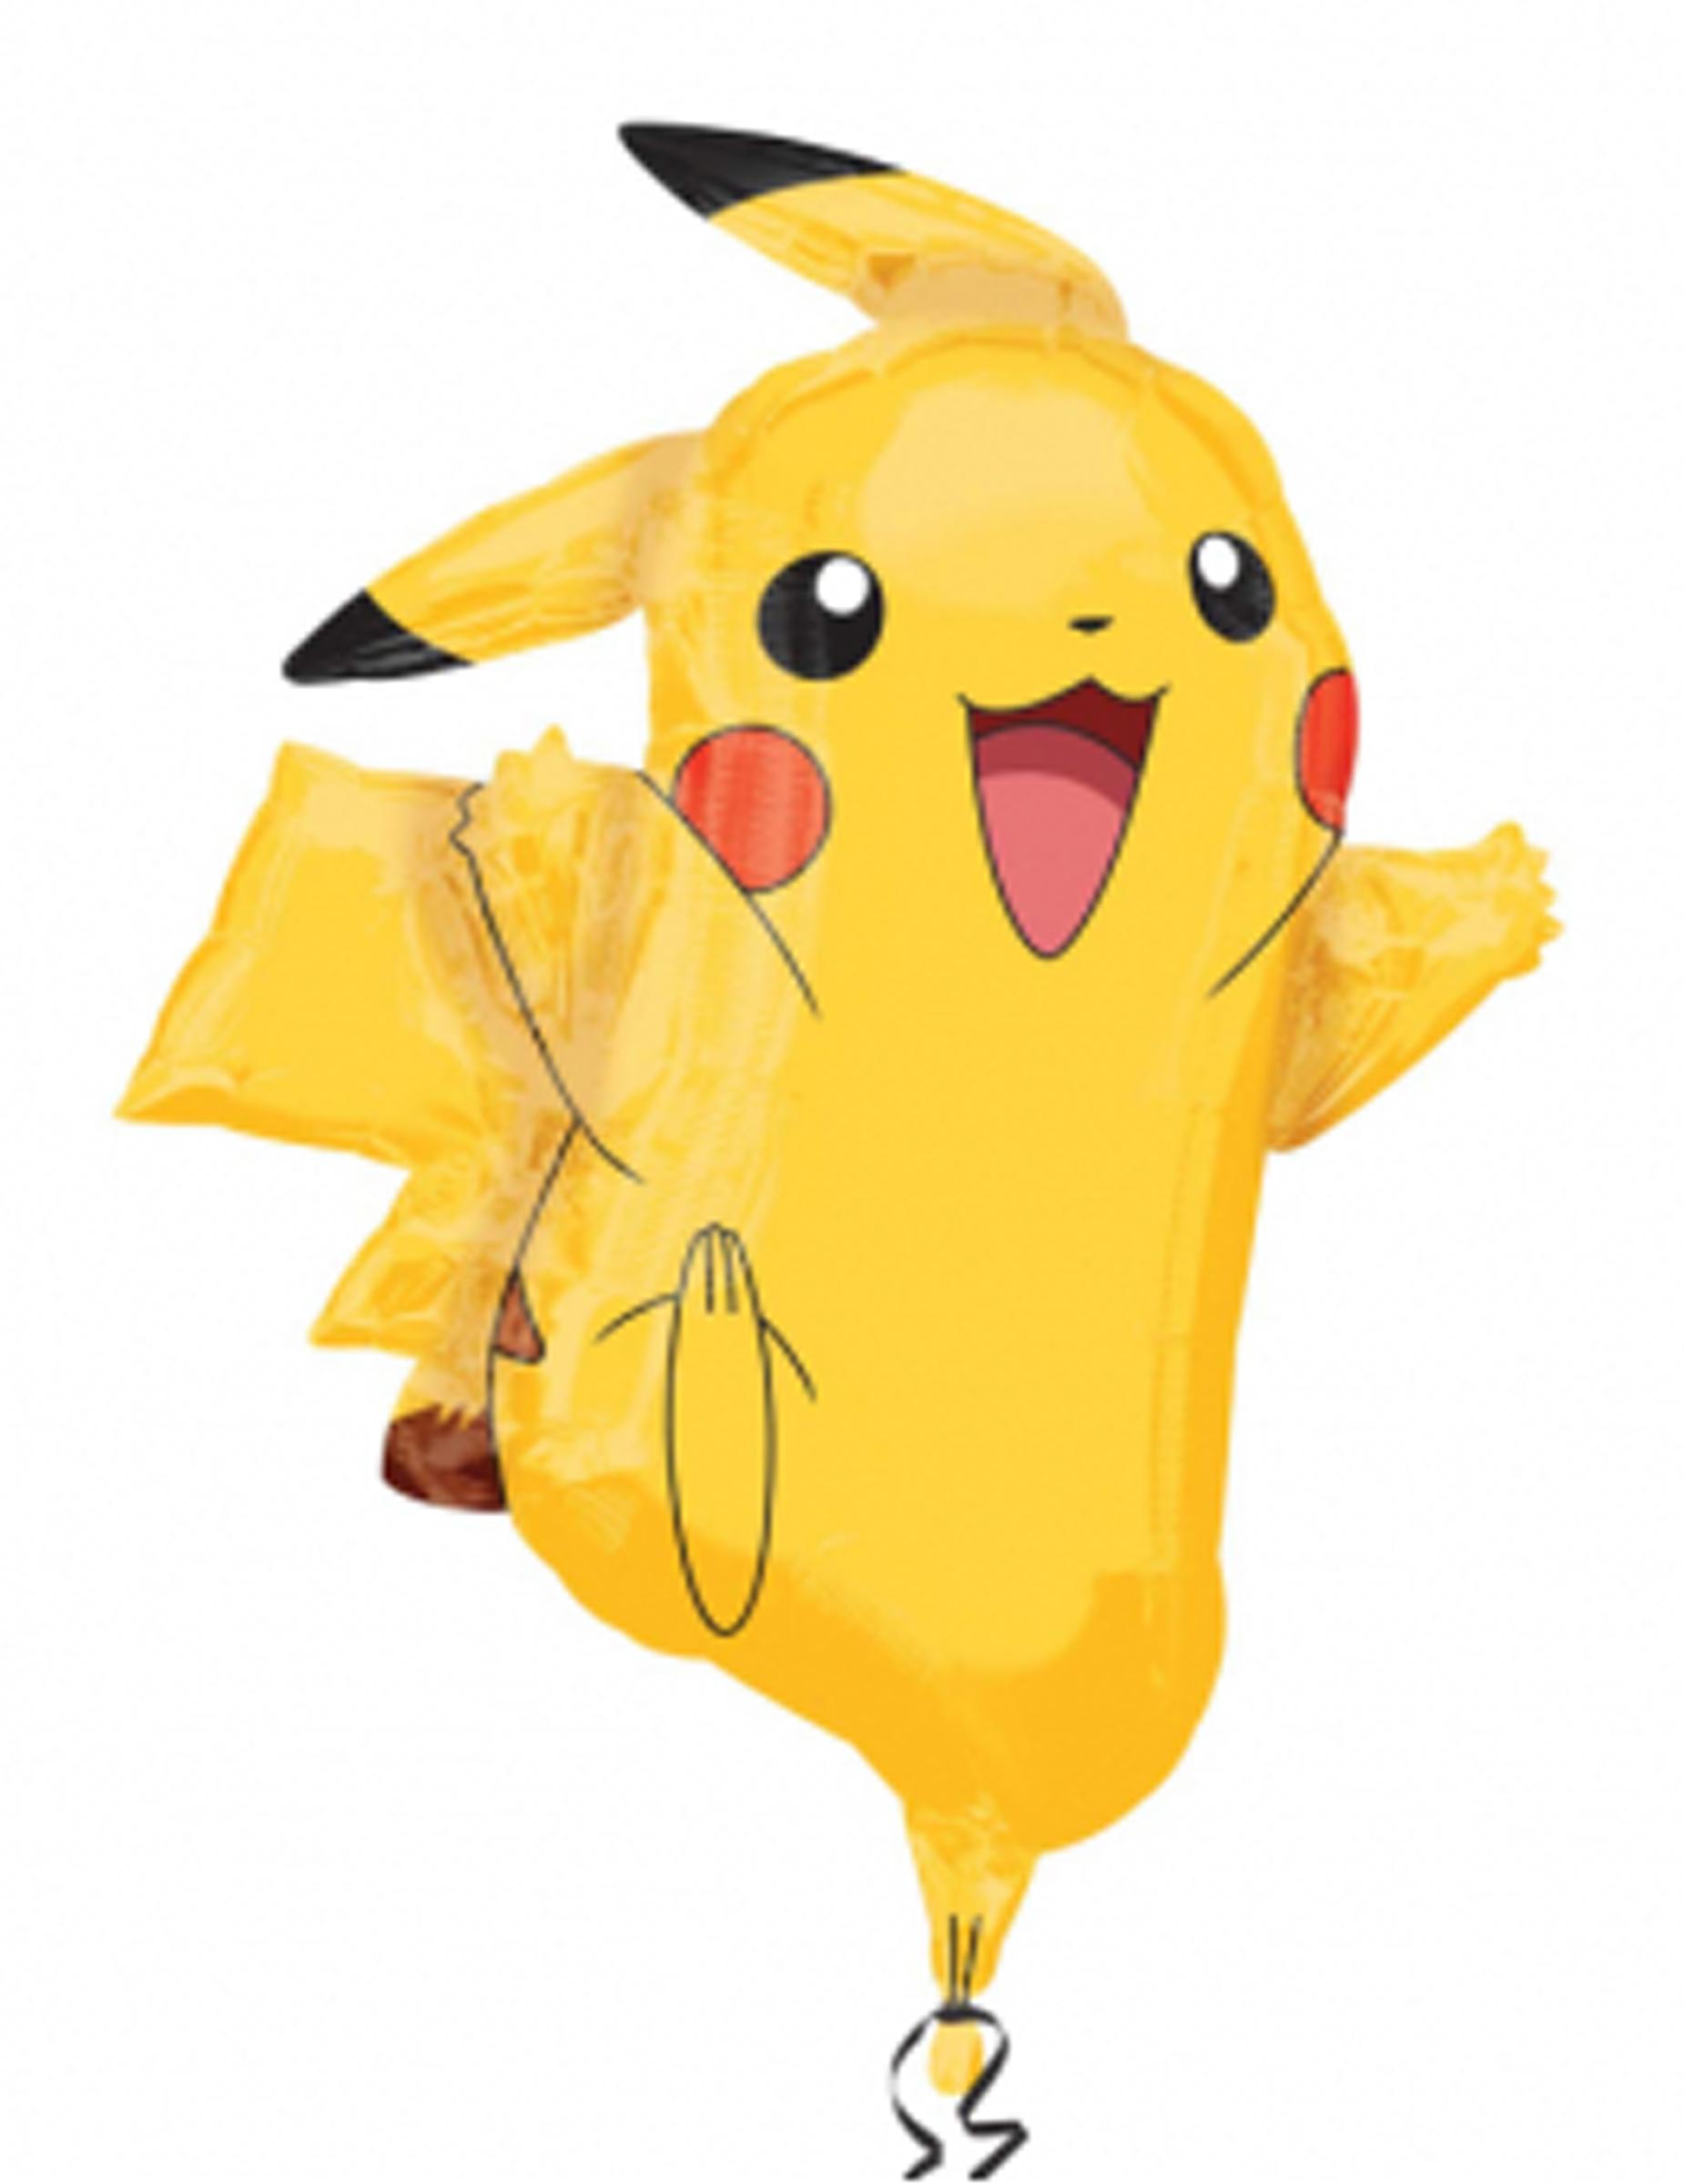 Ballon aluminium Pikachu Pokémon ™ 62 x 78 cm, décoration ... on